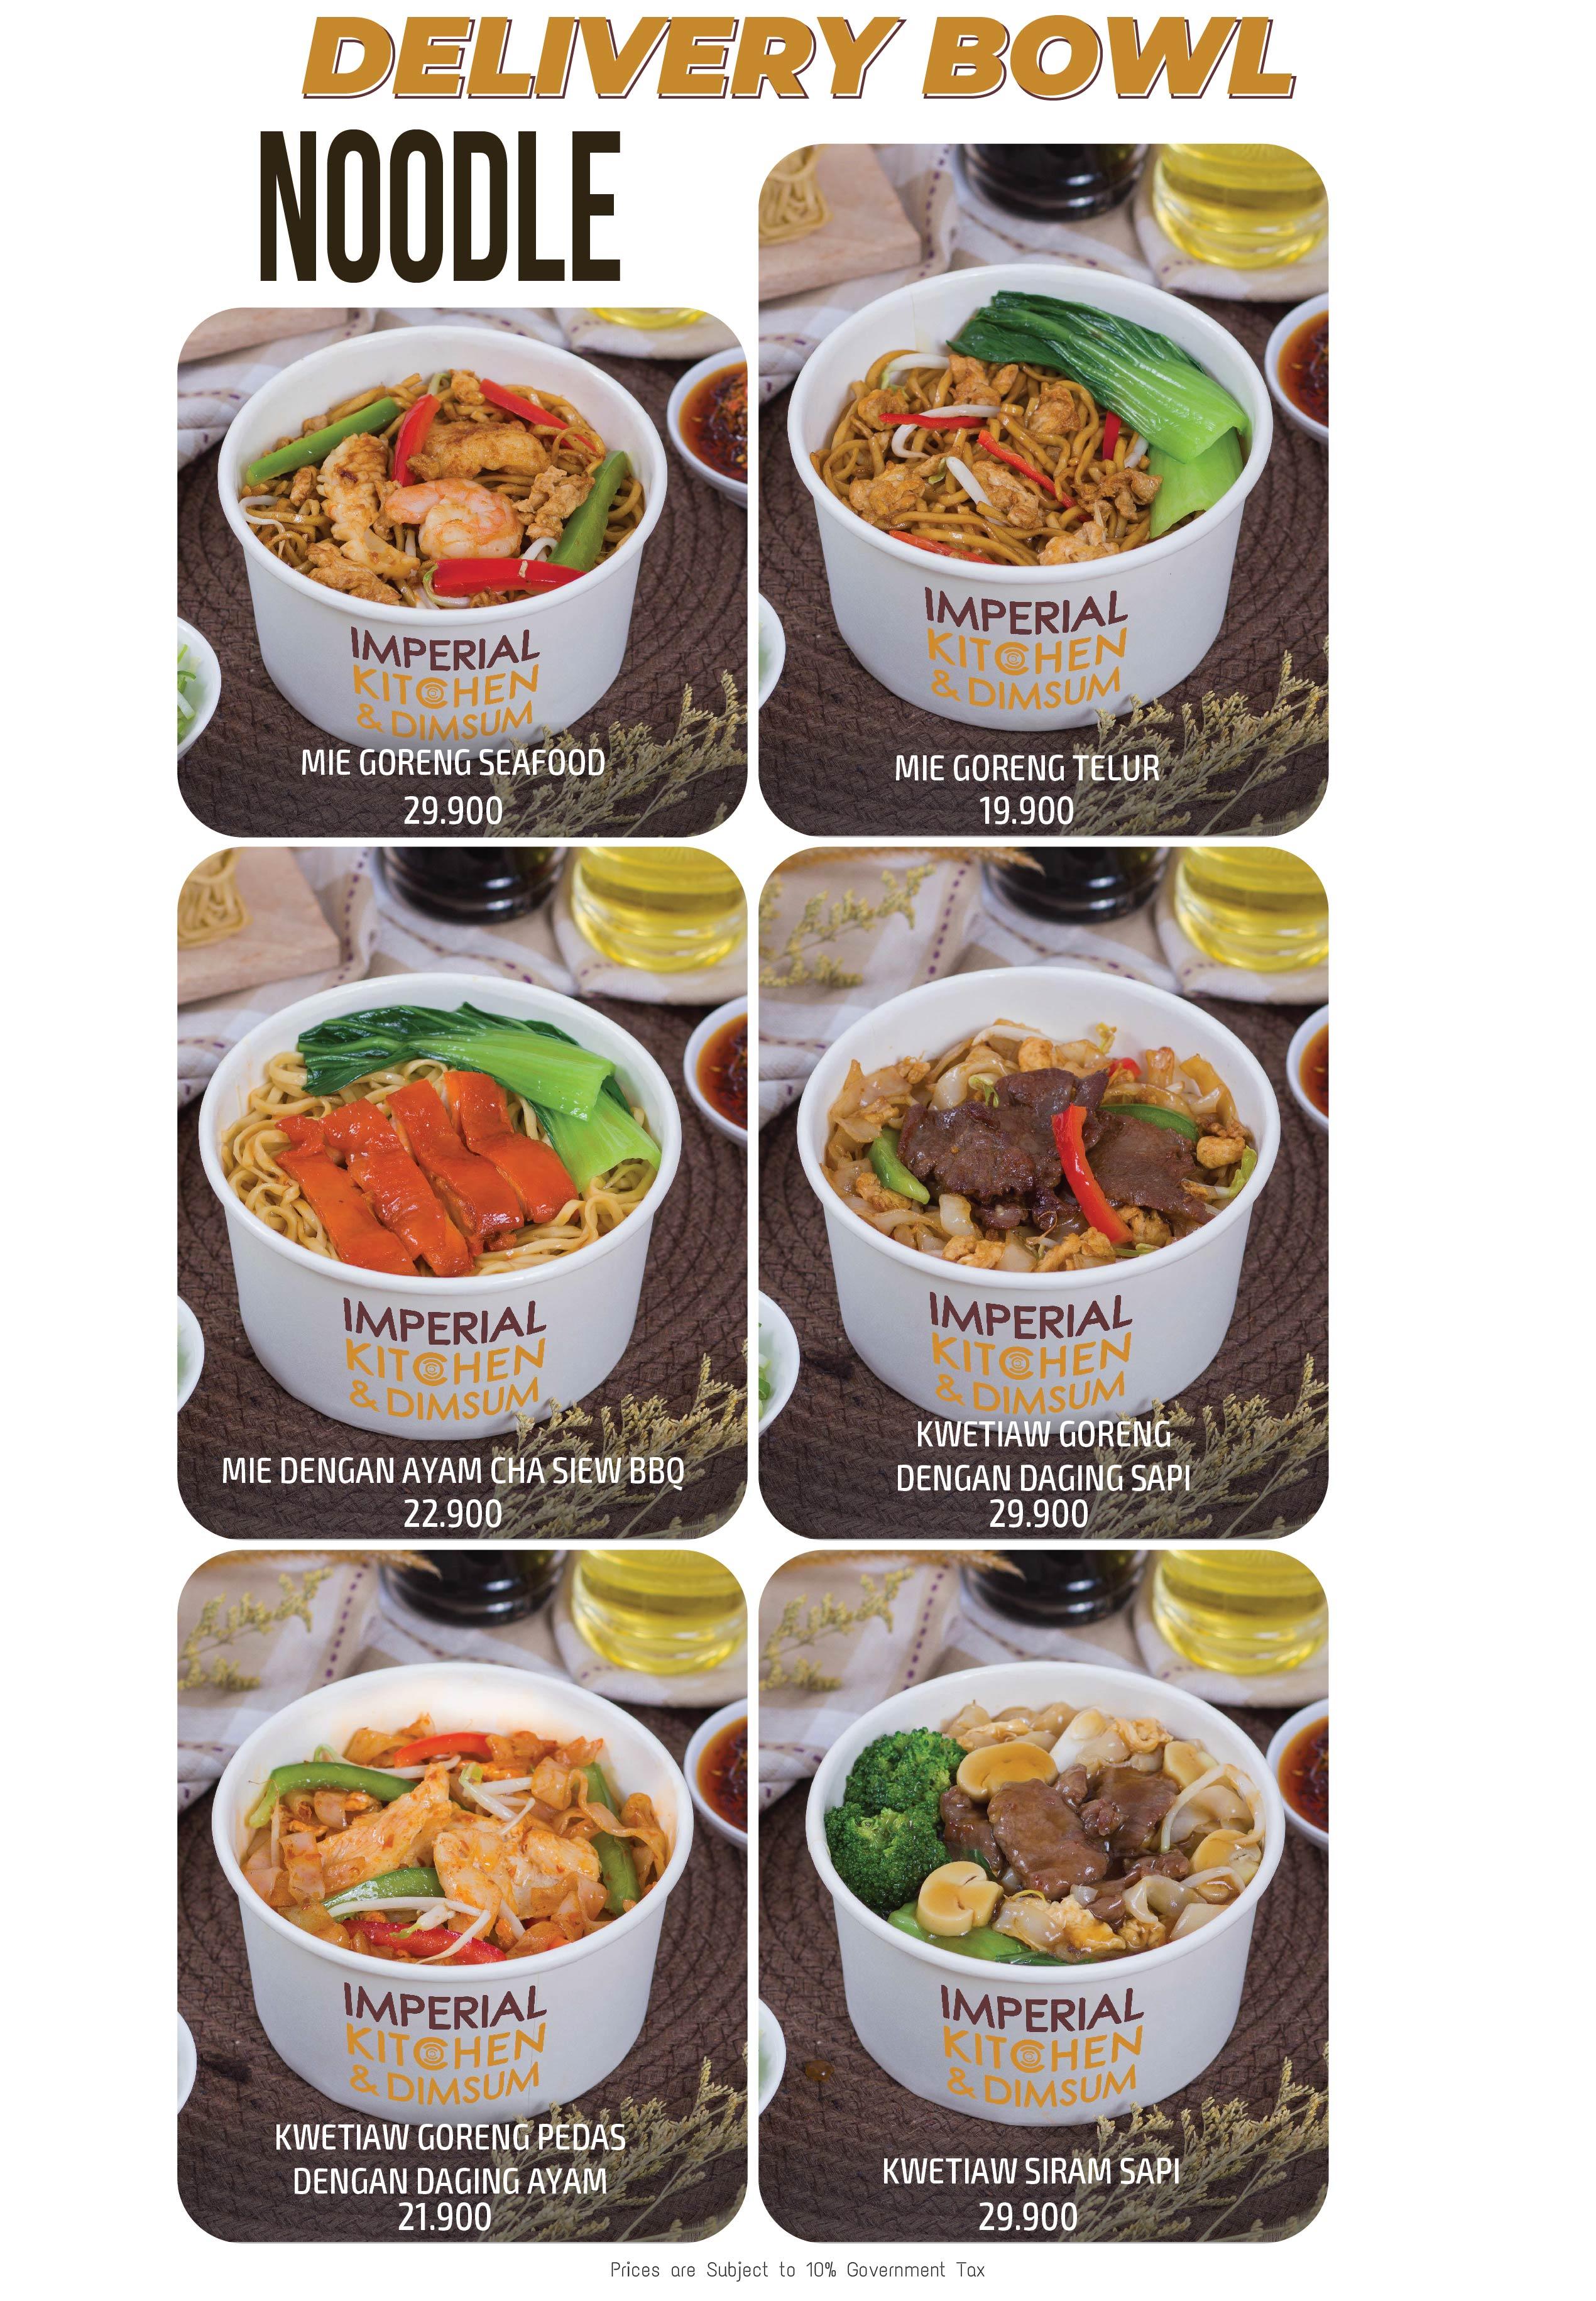 Delivery Bowl - Noodle